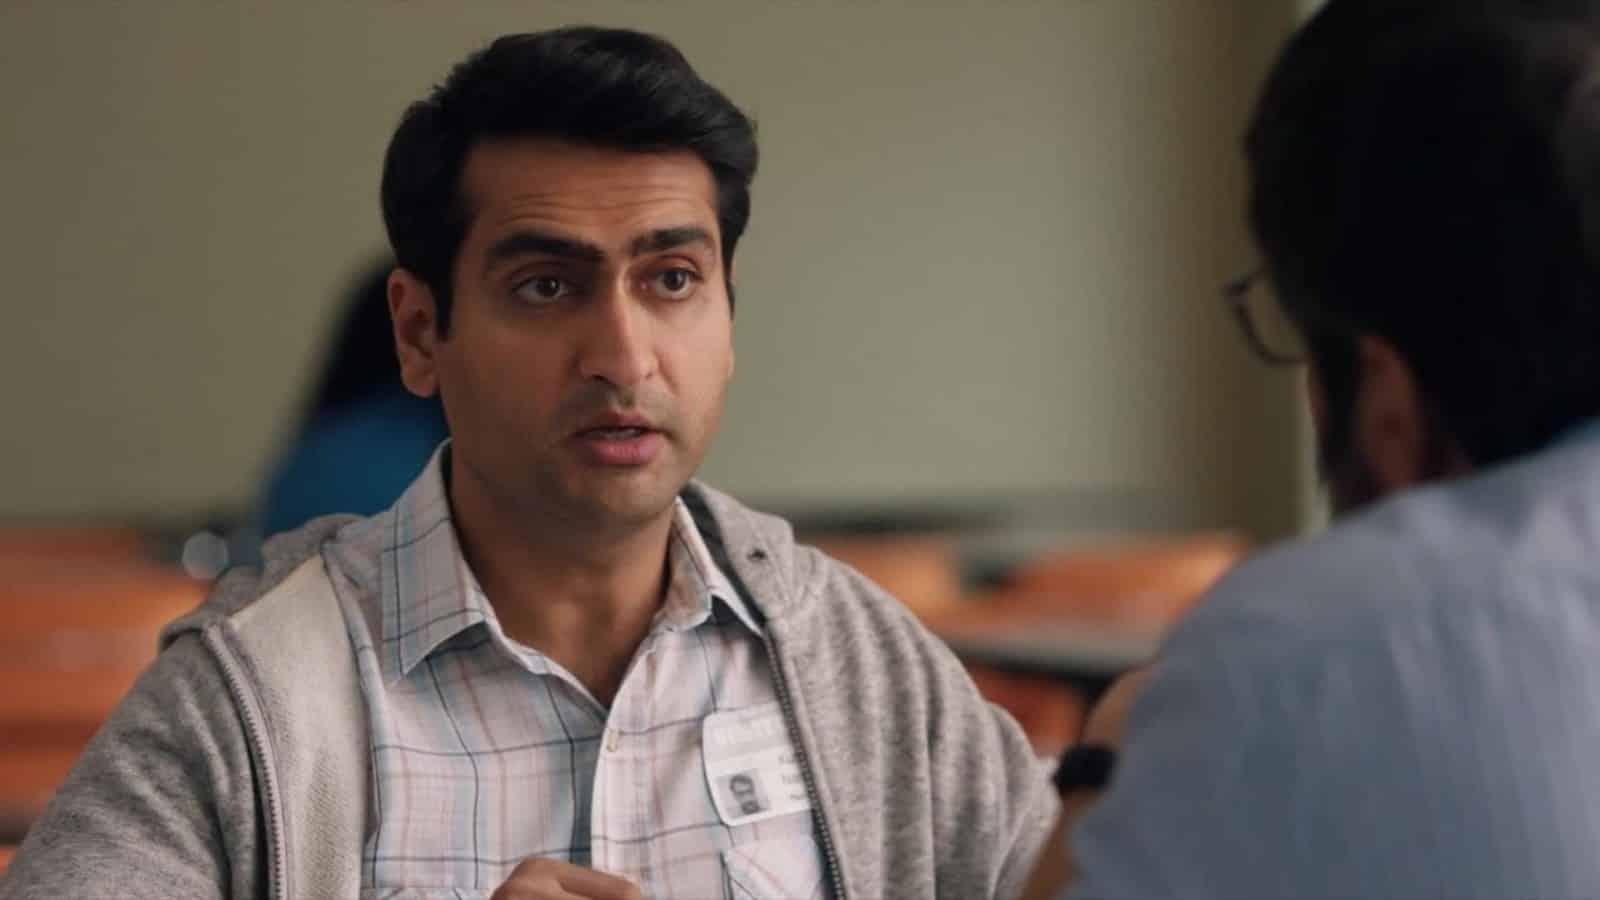 Zahrá si herec Kumail Nanjiani hlavnú úlohu?